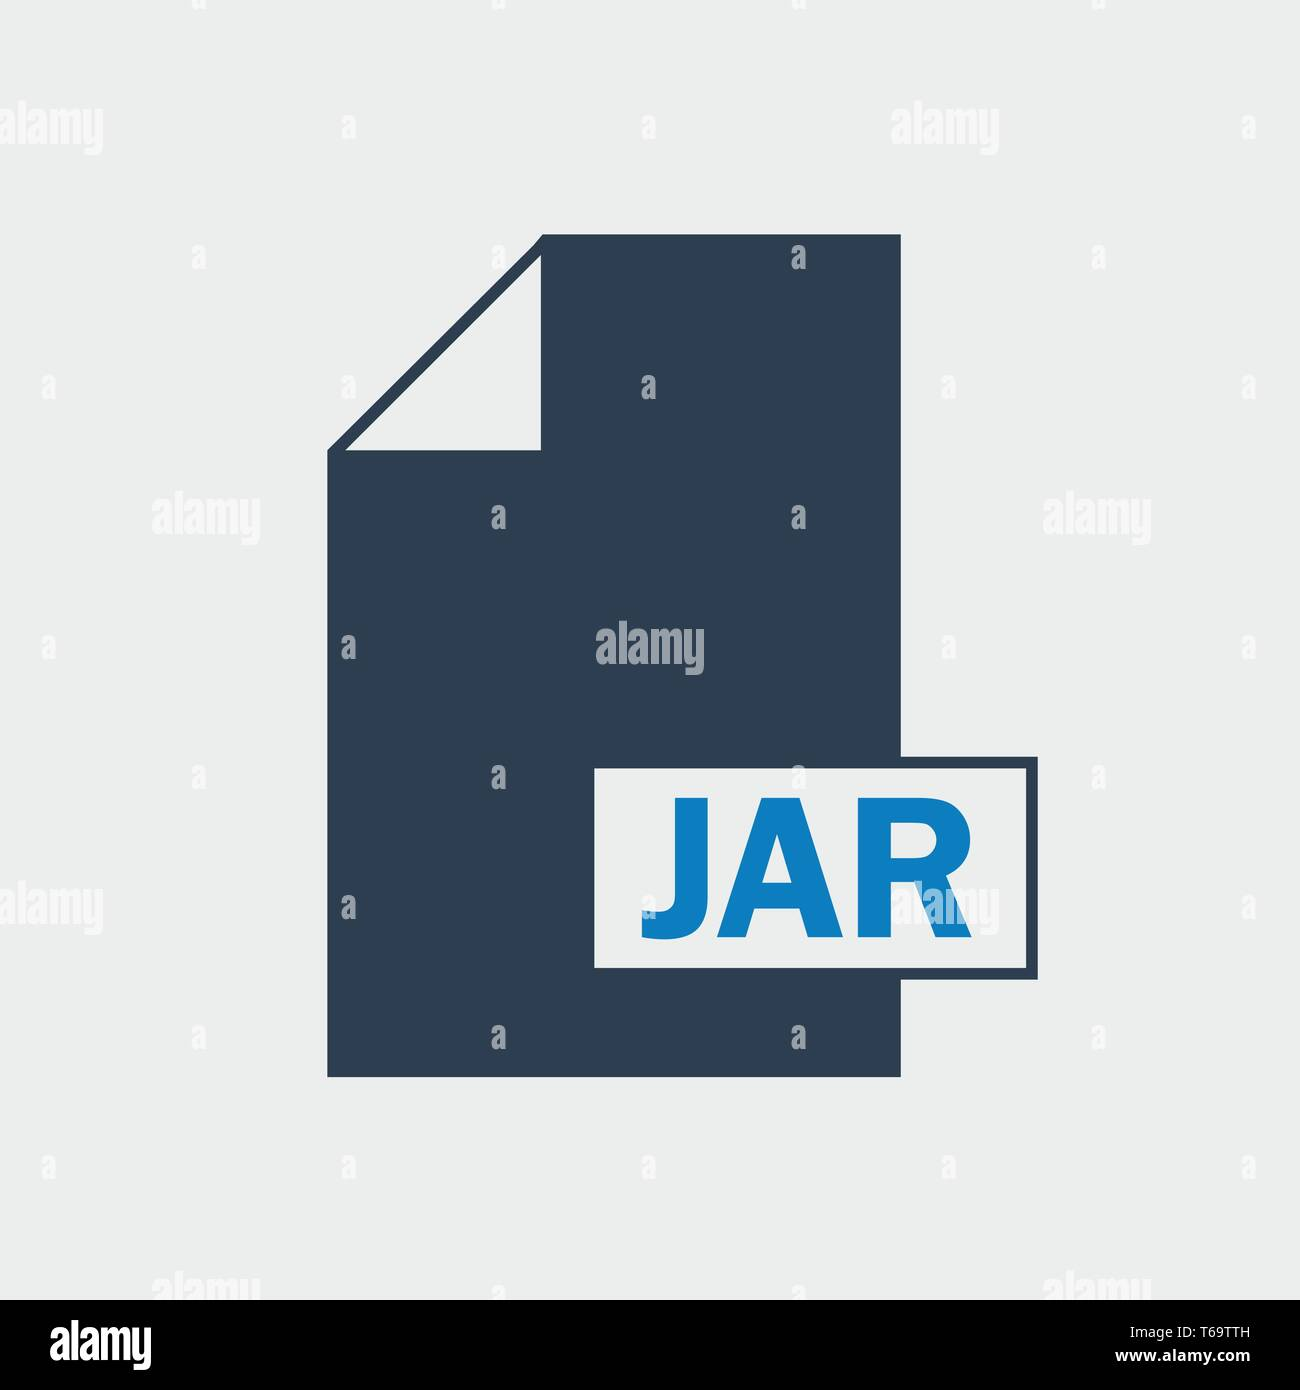 Jar File Type Stock Photos & Jar File Type Stock Images - Alamy